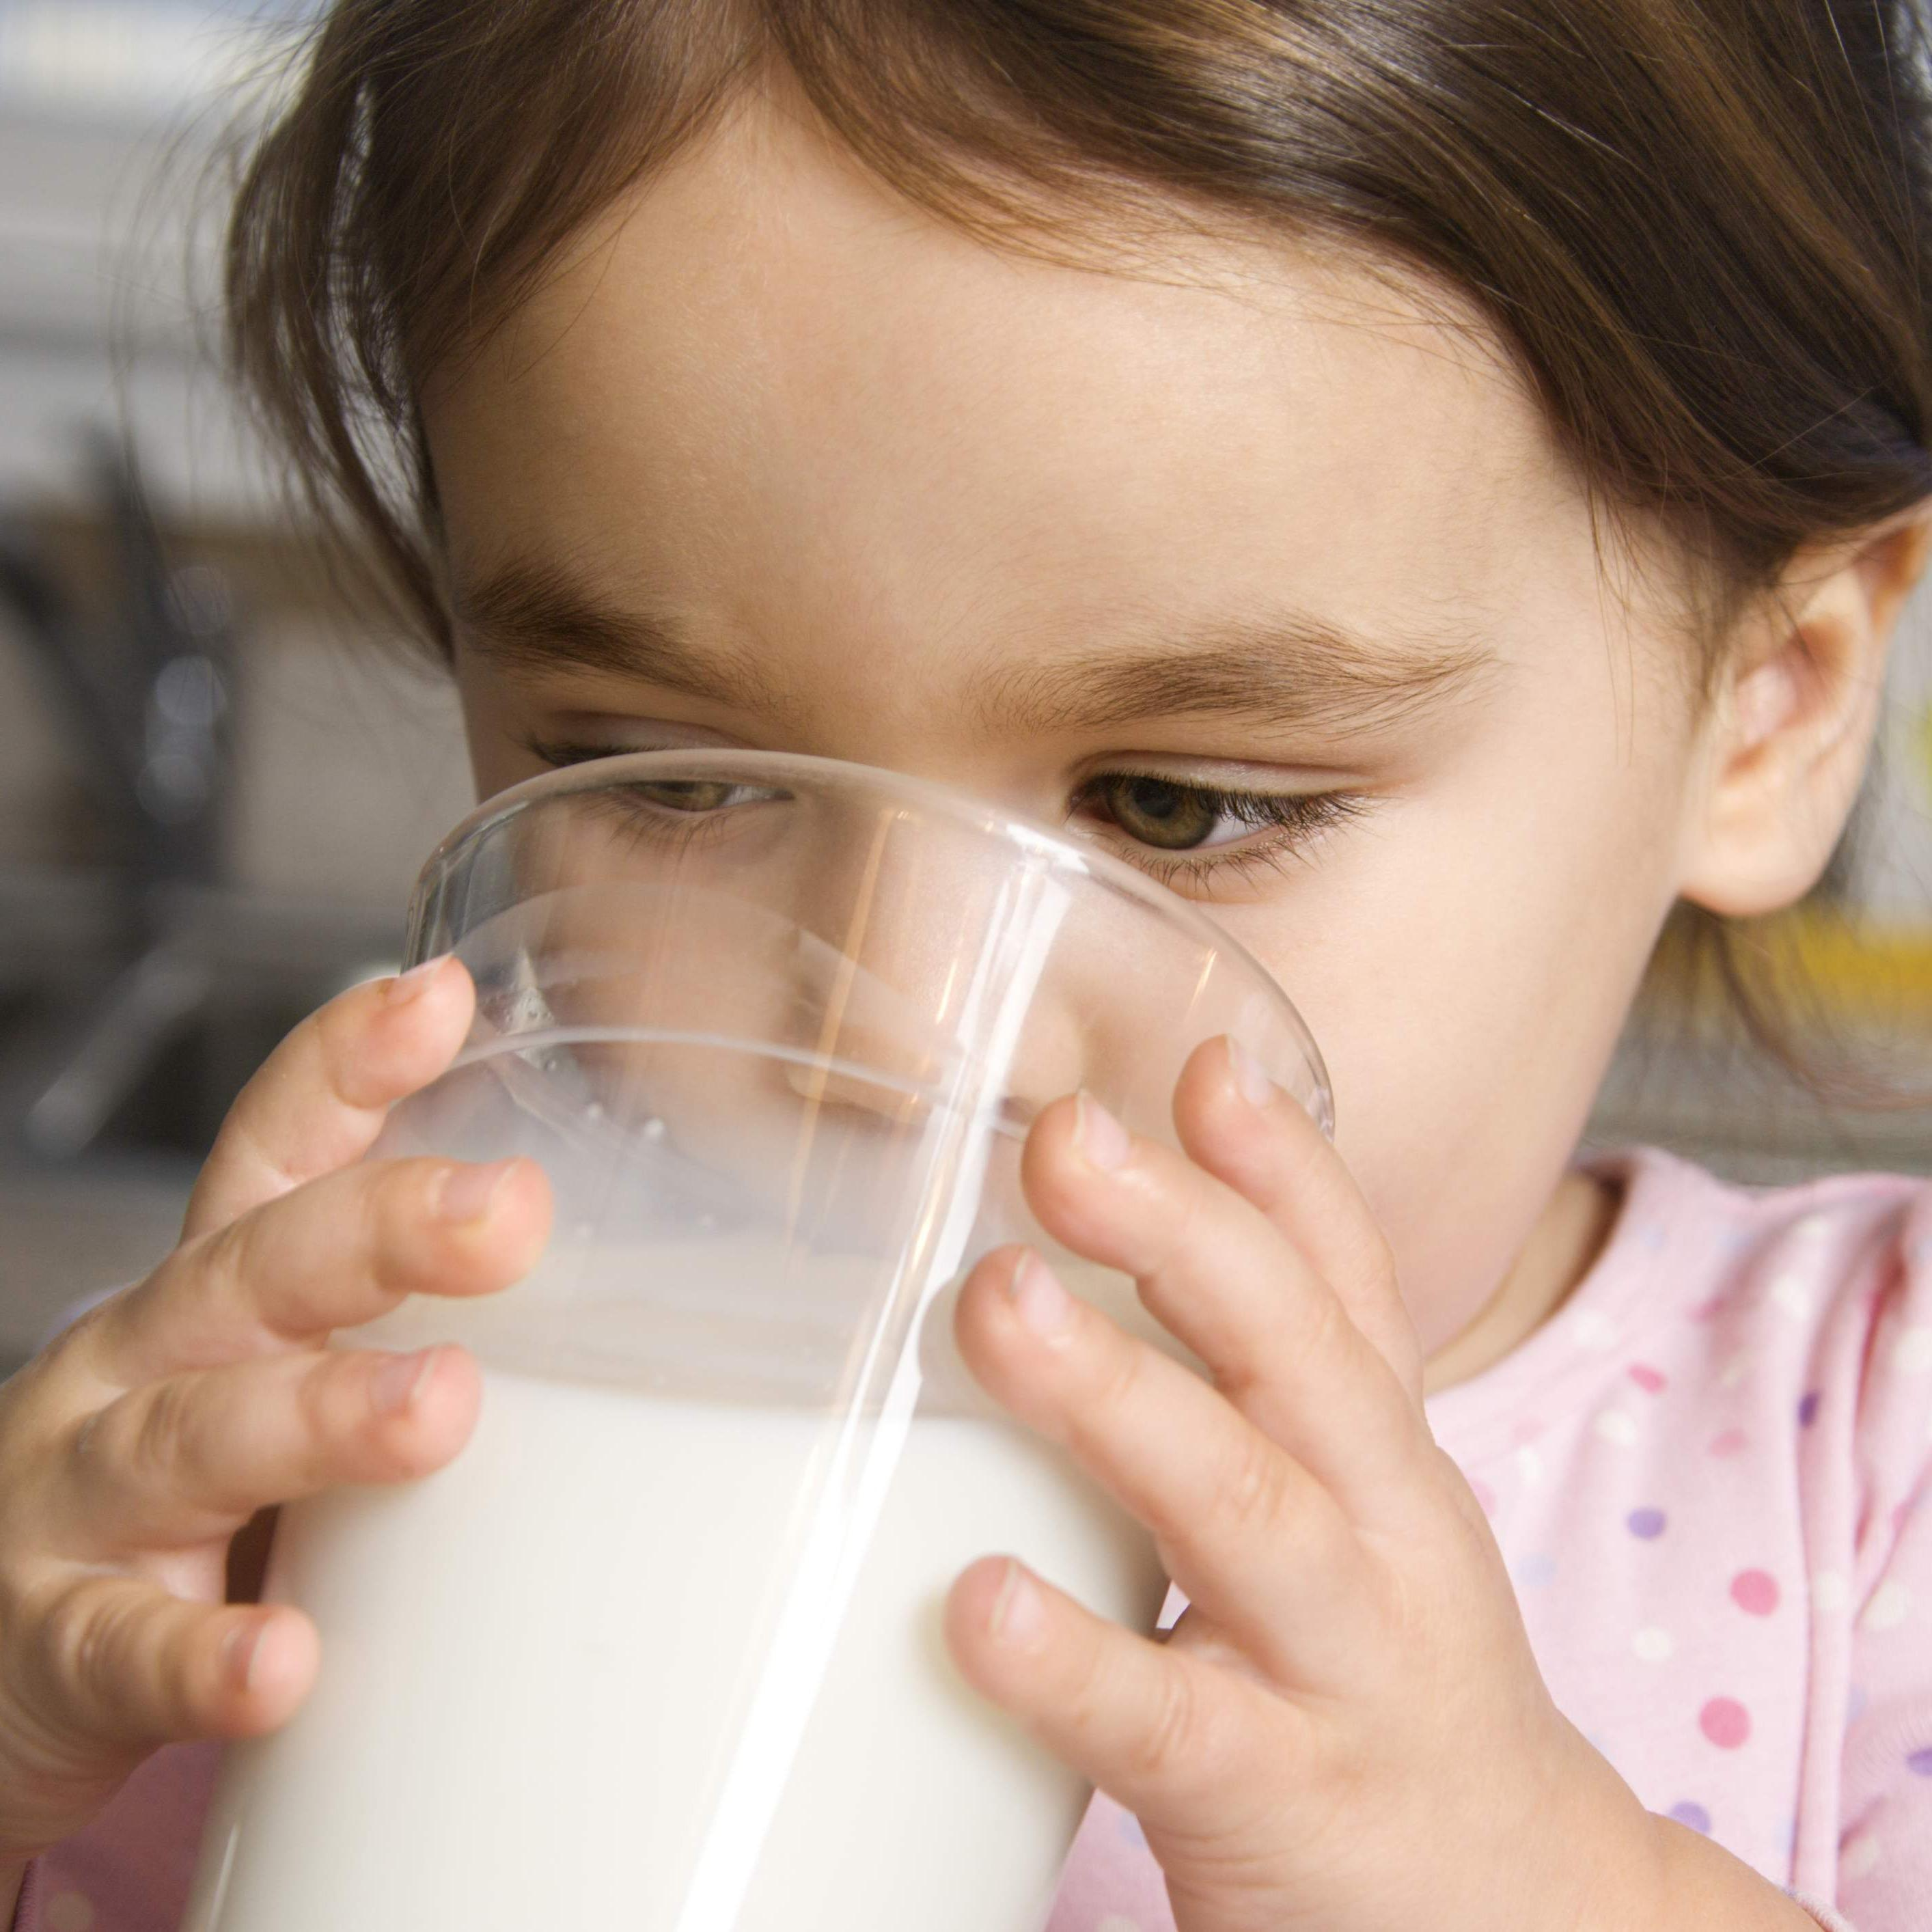 Intolerância à Lactose – O Que é Lactose e Porque Ocorre a Intolerância